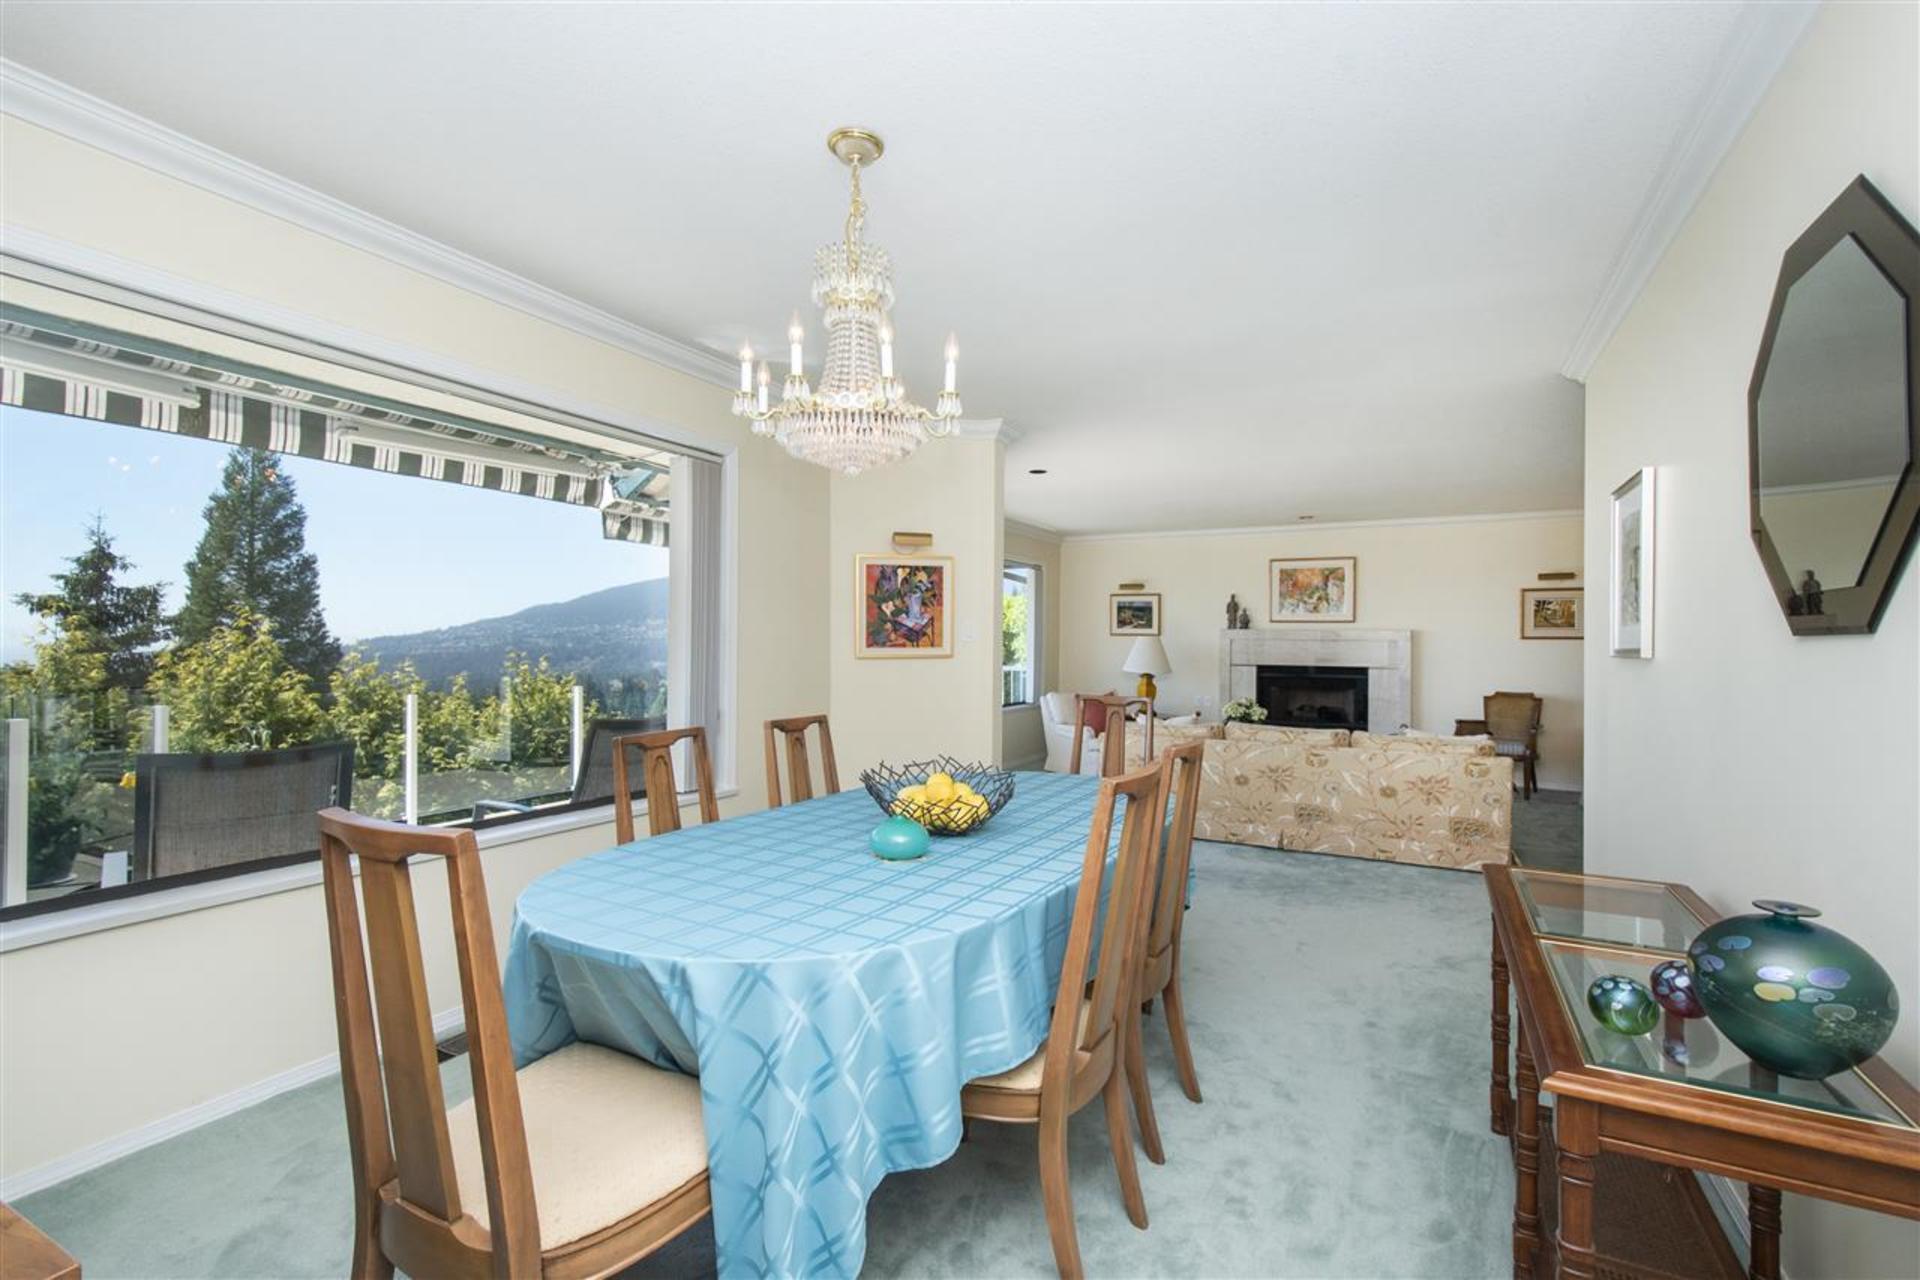 4285-prospect-road-upper-delbrook-north-vancouver-07 at 4285 Prospect Road, Upper Delbrook, North Vancouver